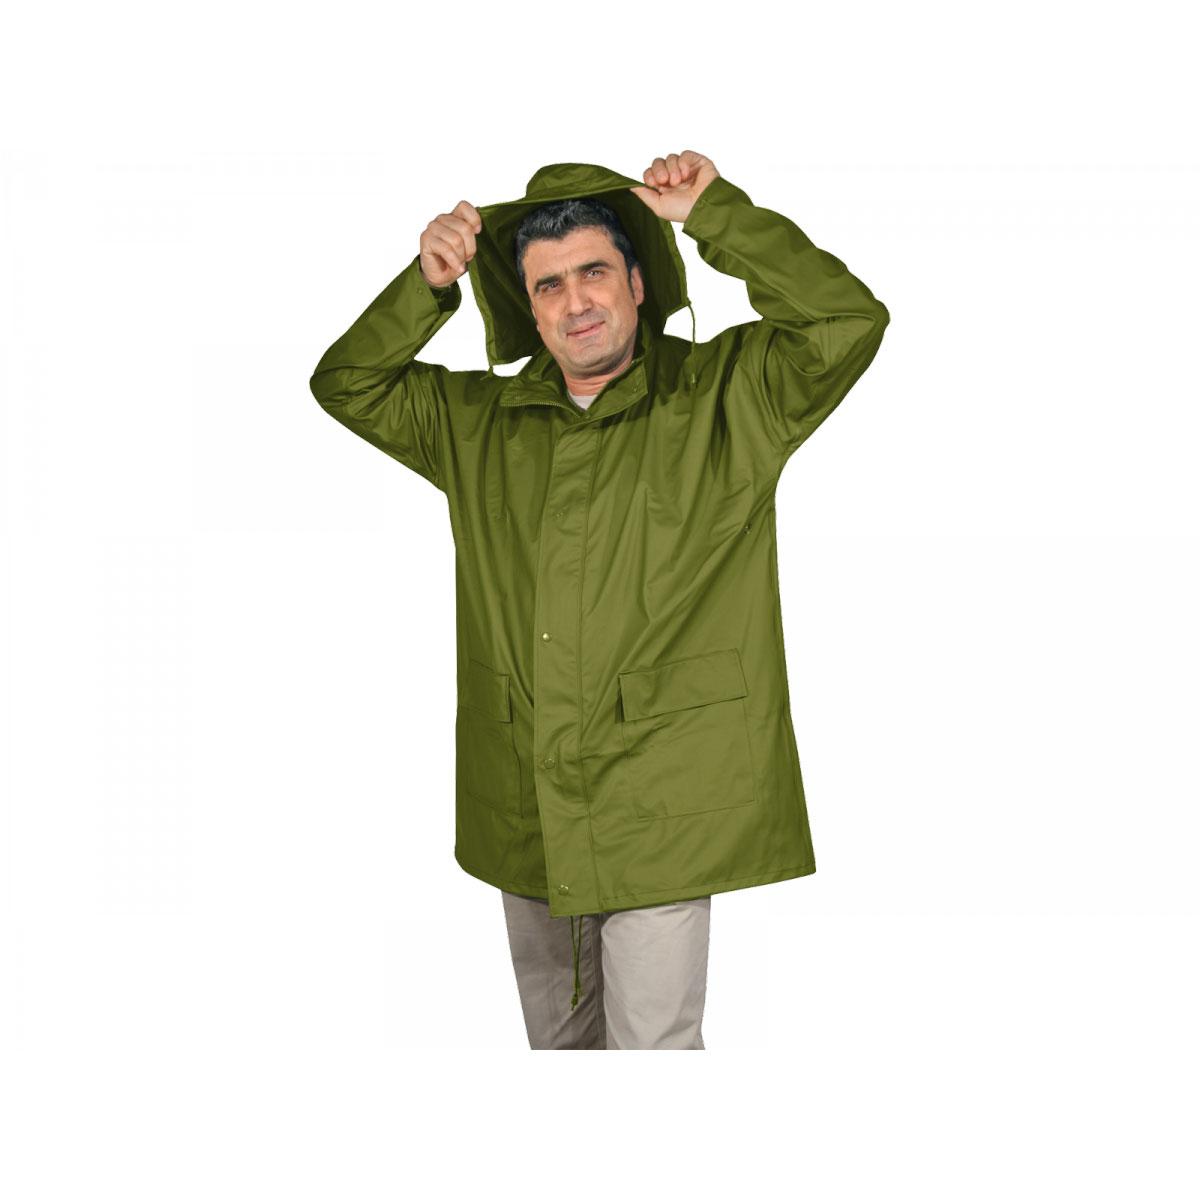 Regenjacke, flexibel, grün, Gr. 62/64